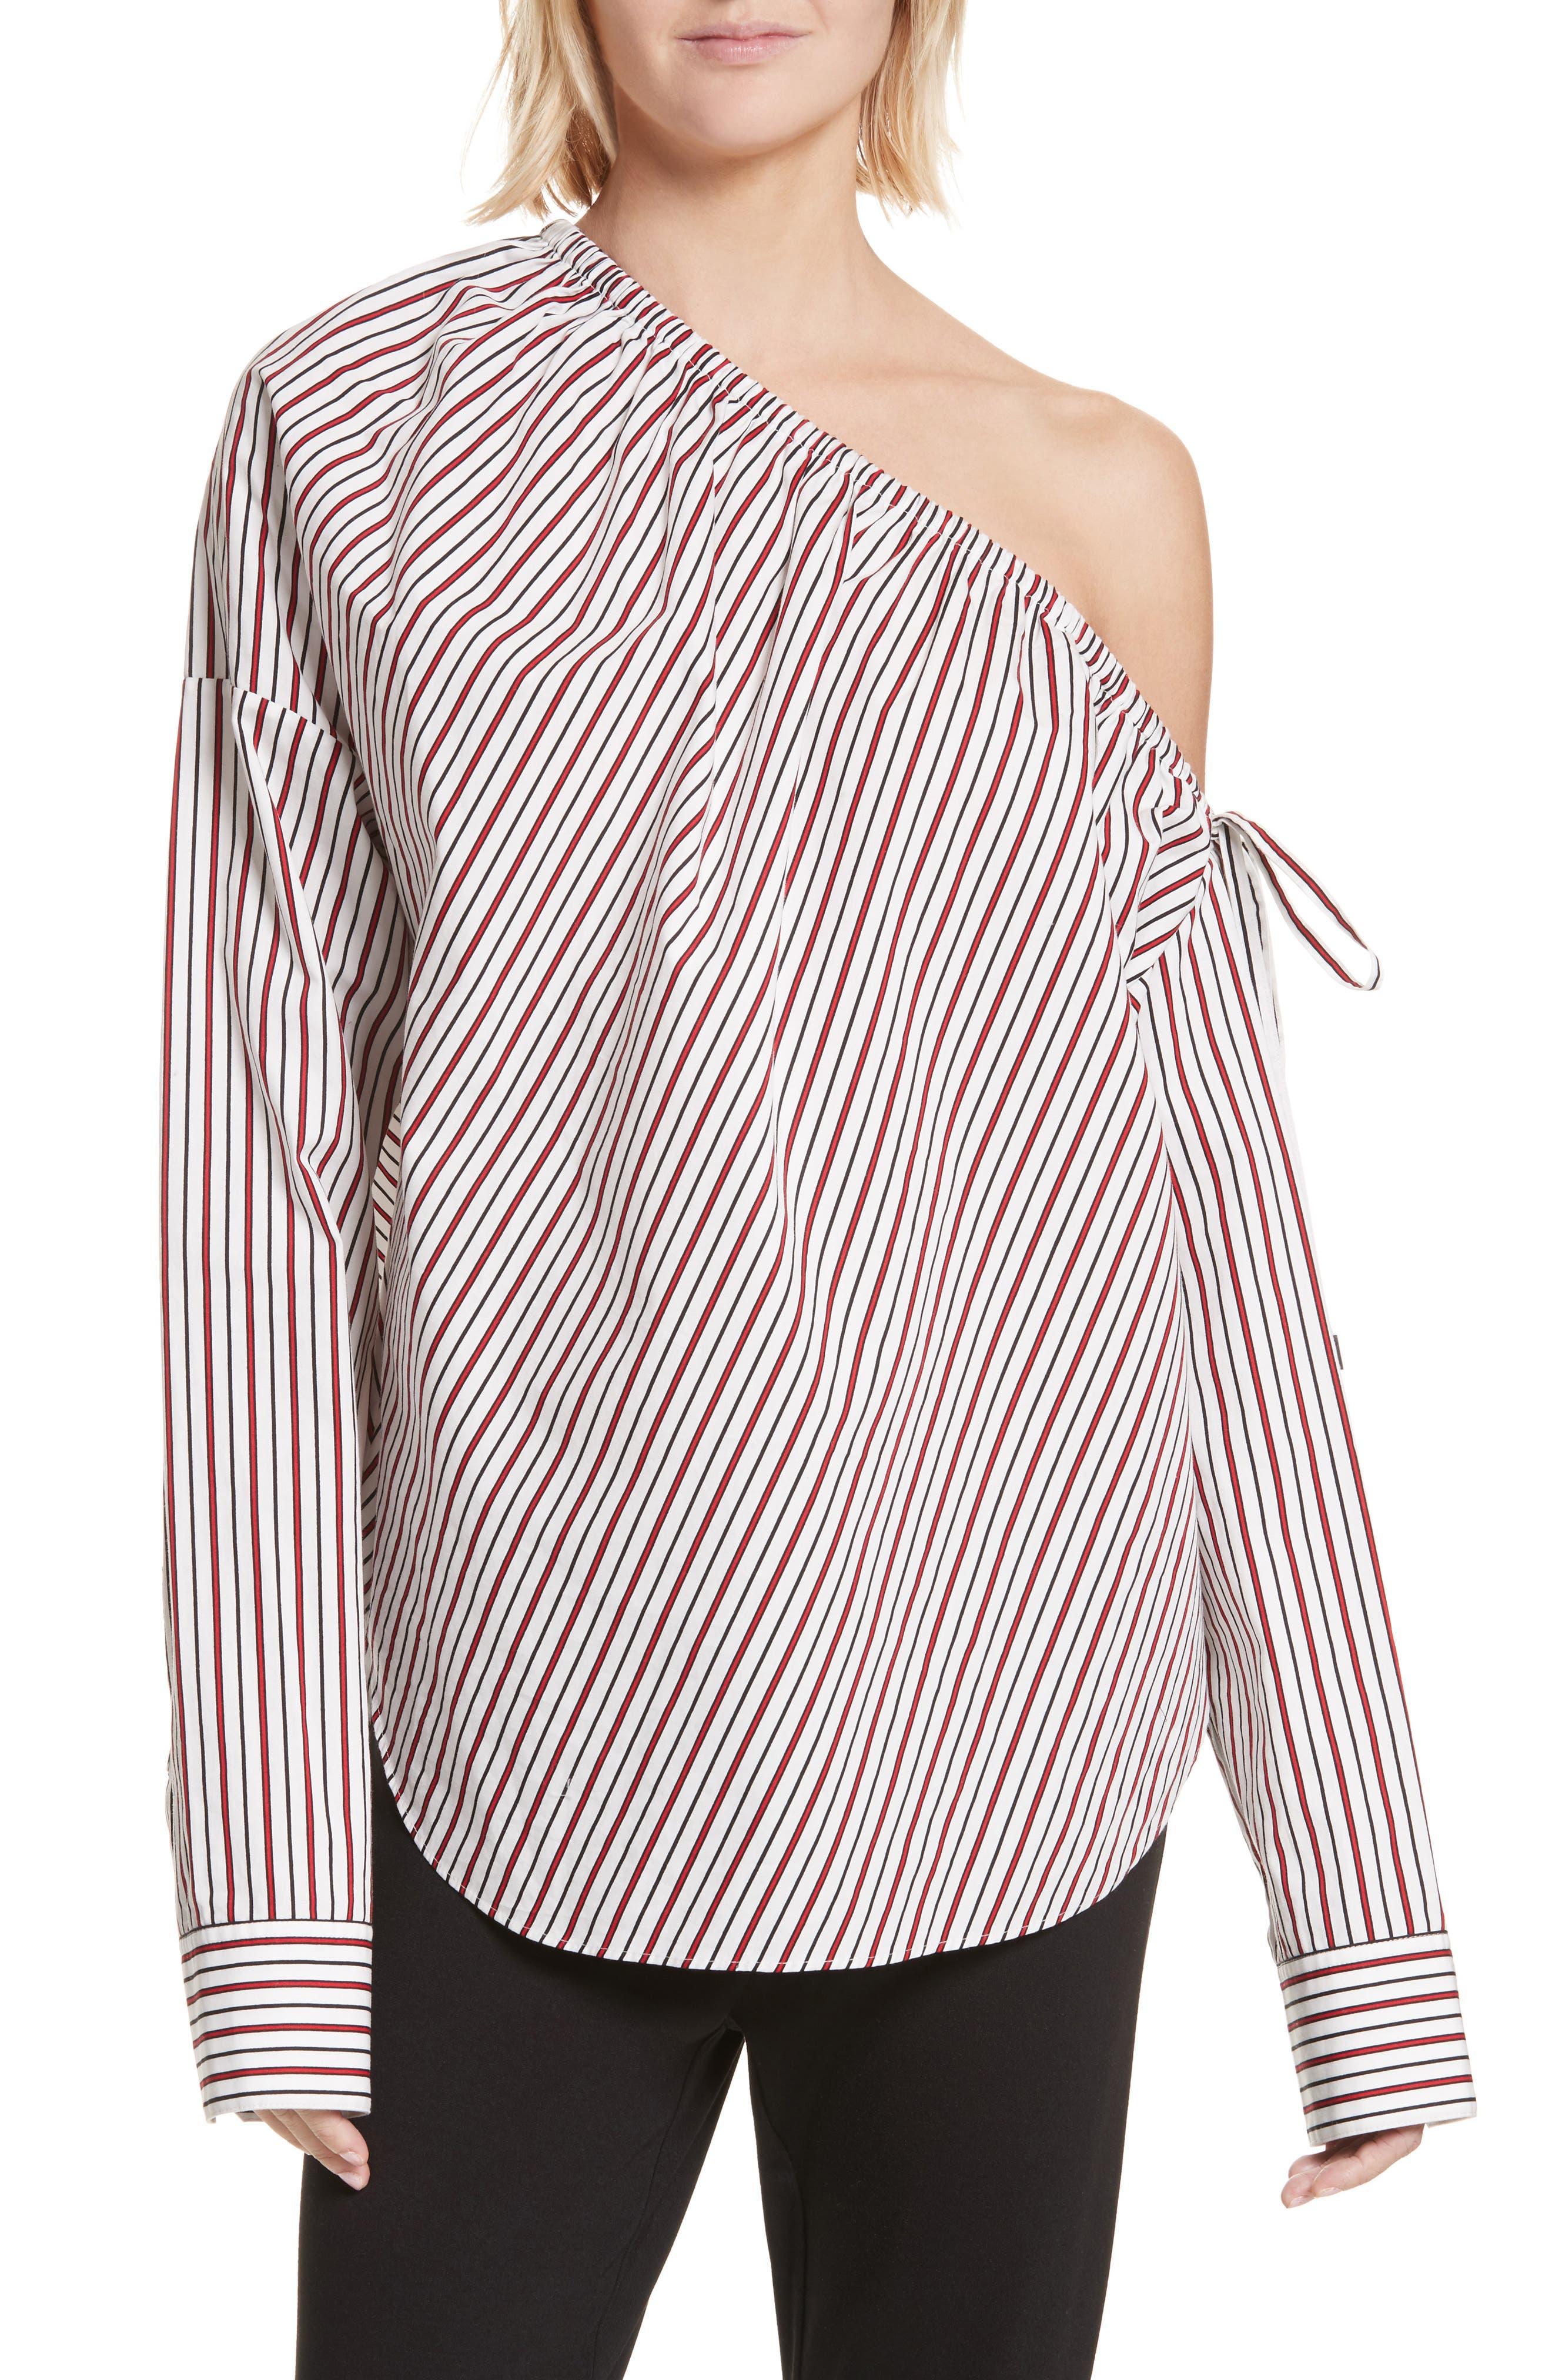 Cinched One-Shoulder Top,                         Main,                         color,